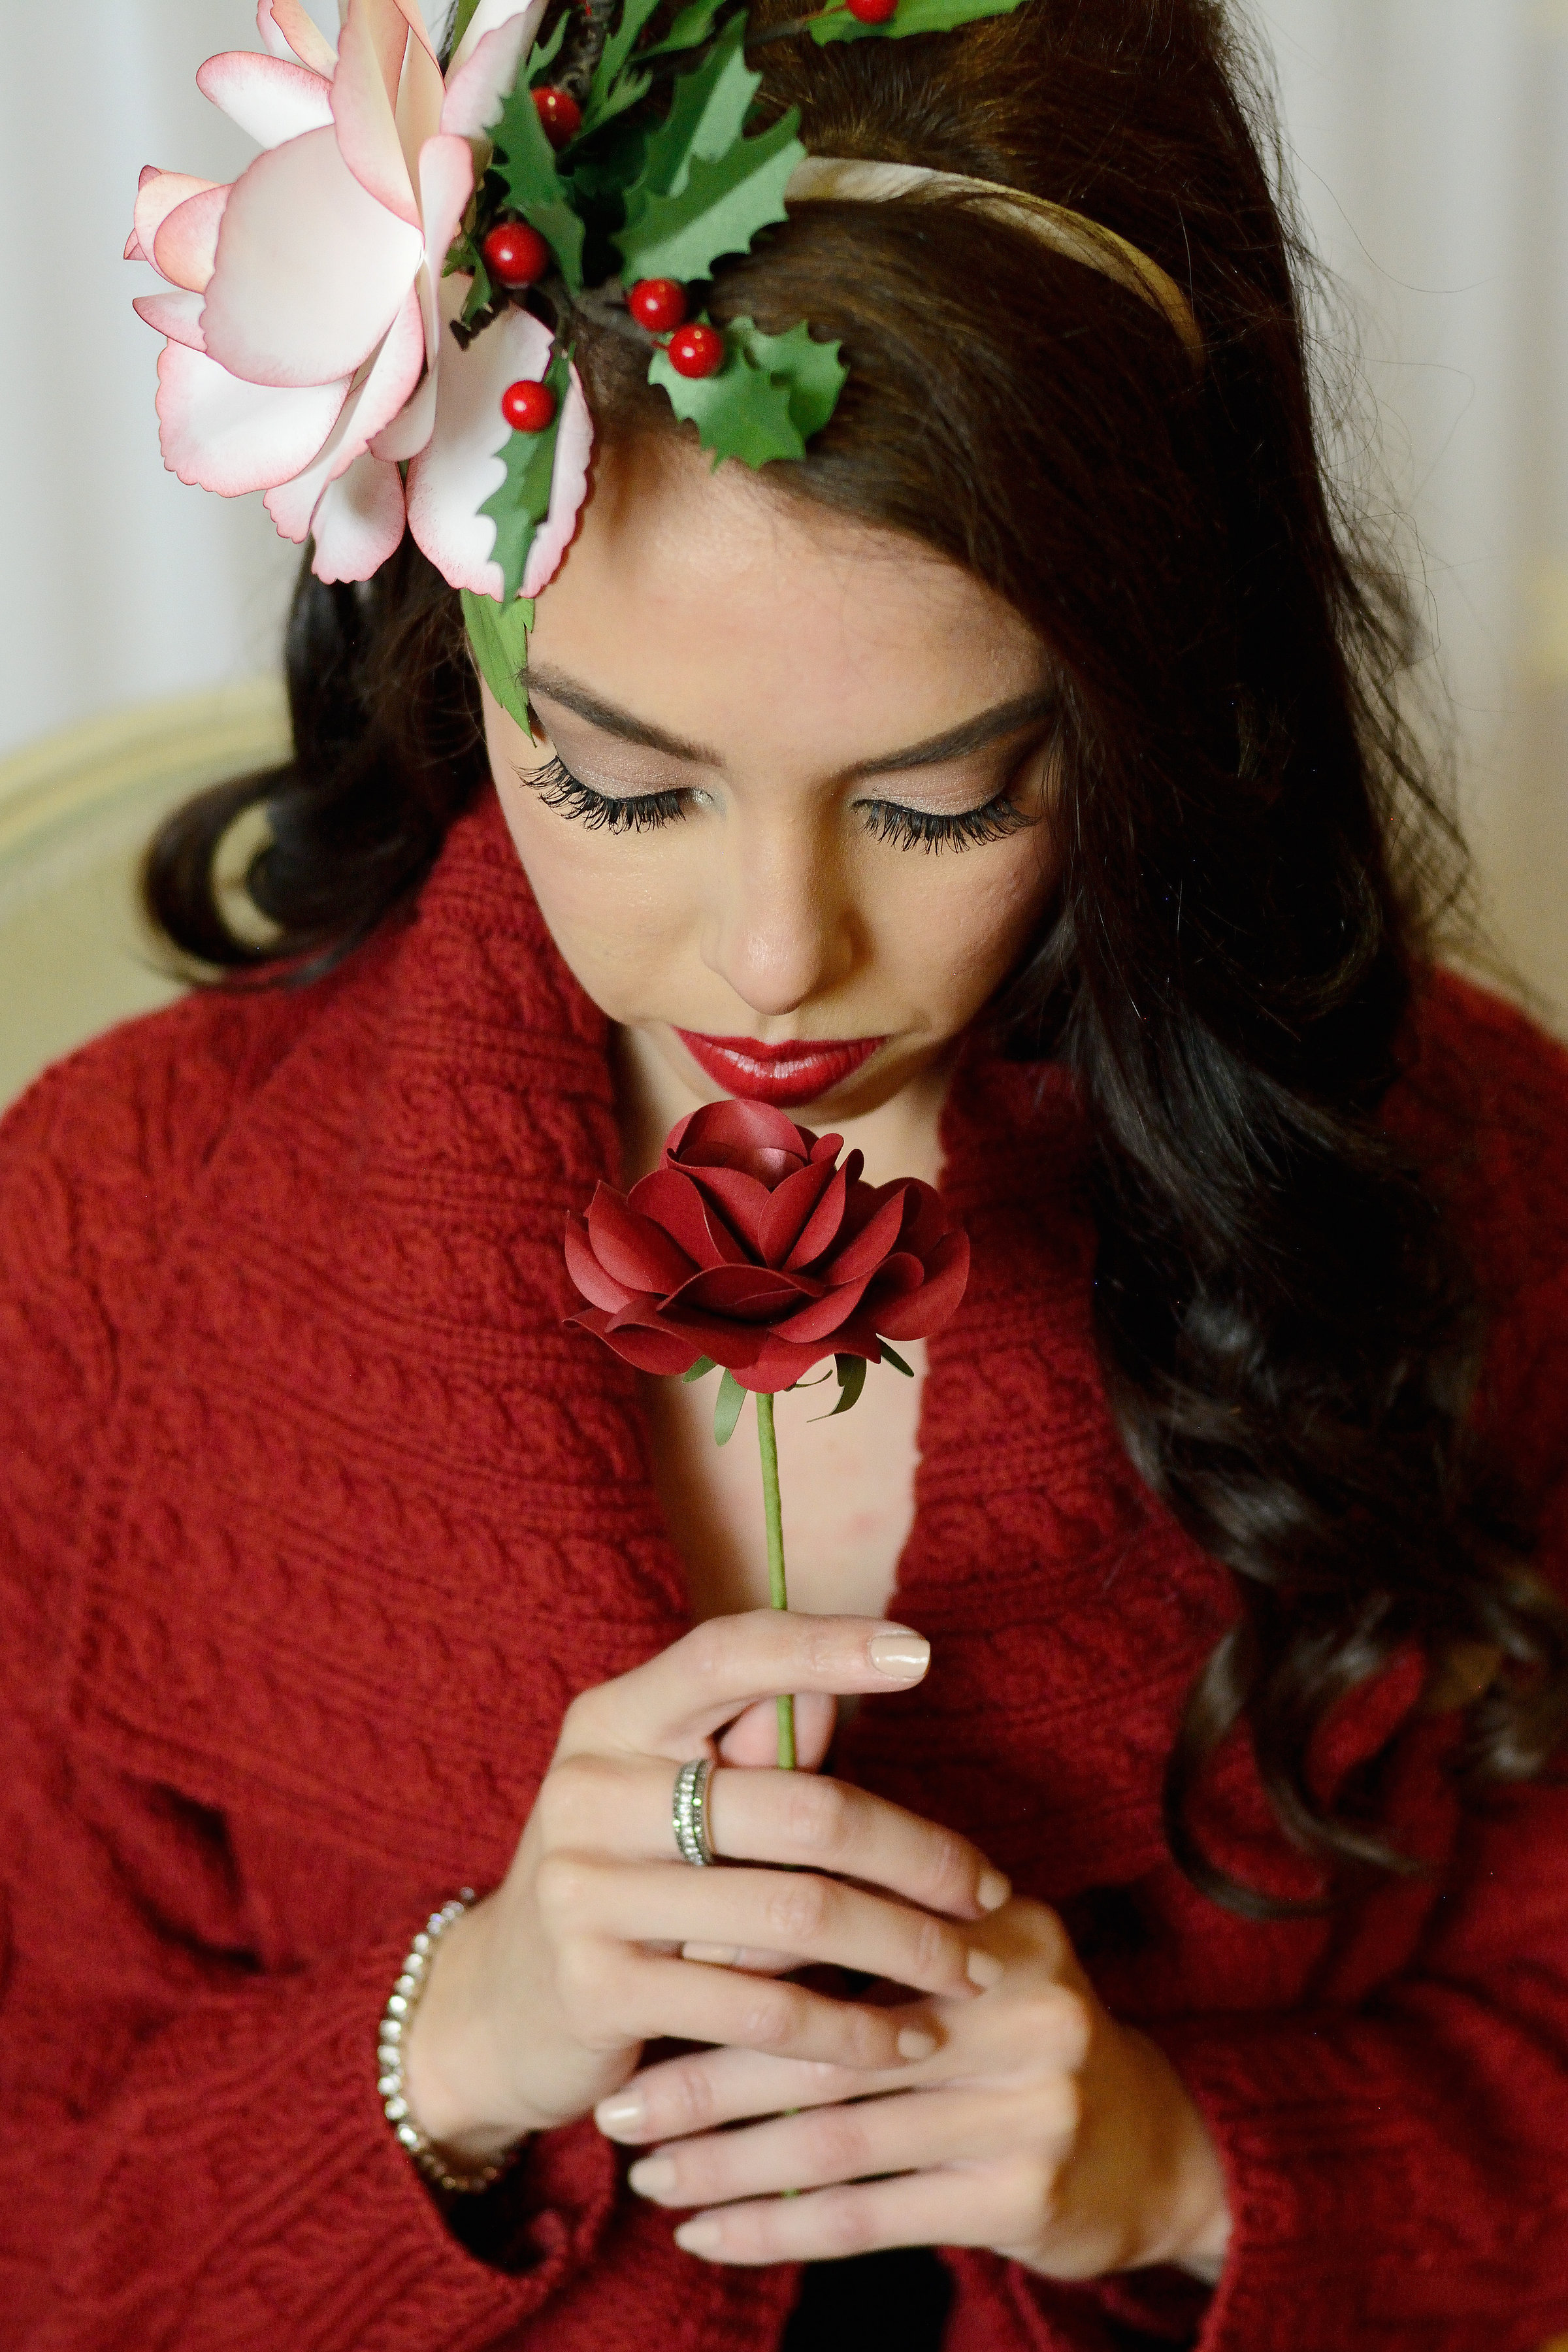 red paper rose 2clvr designs